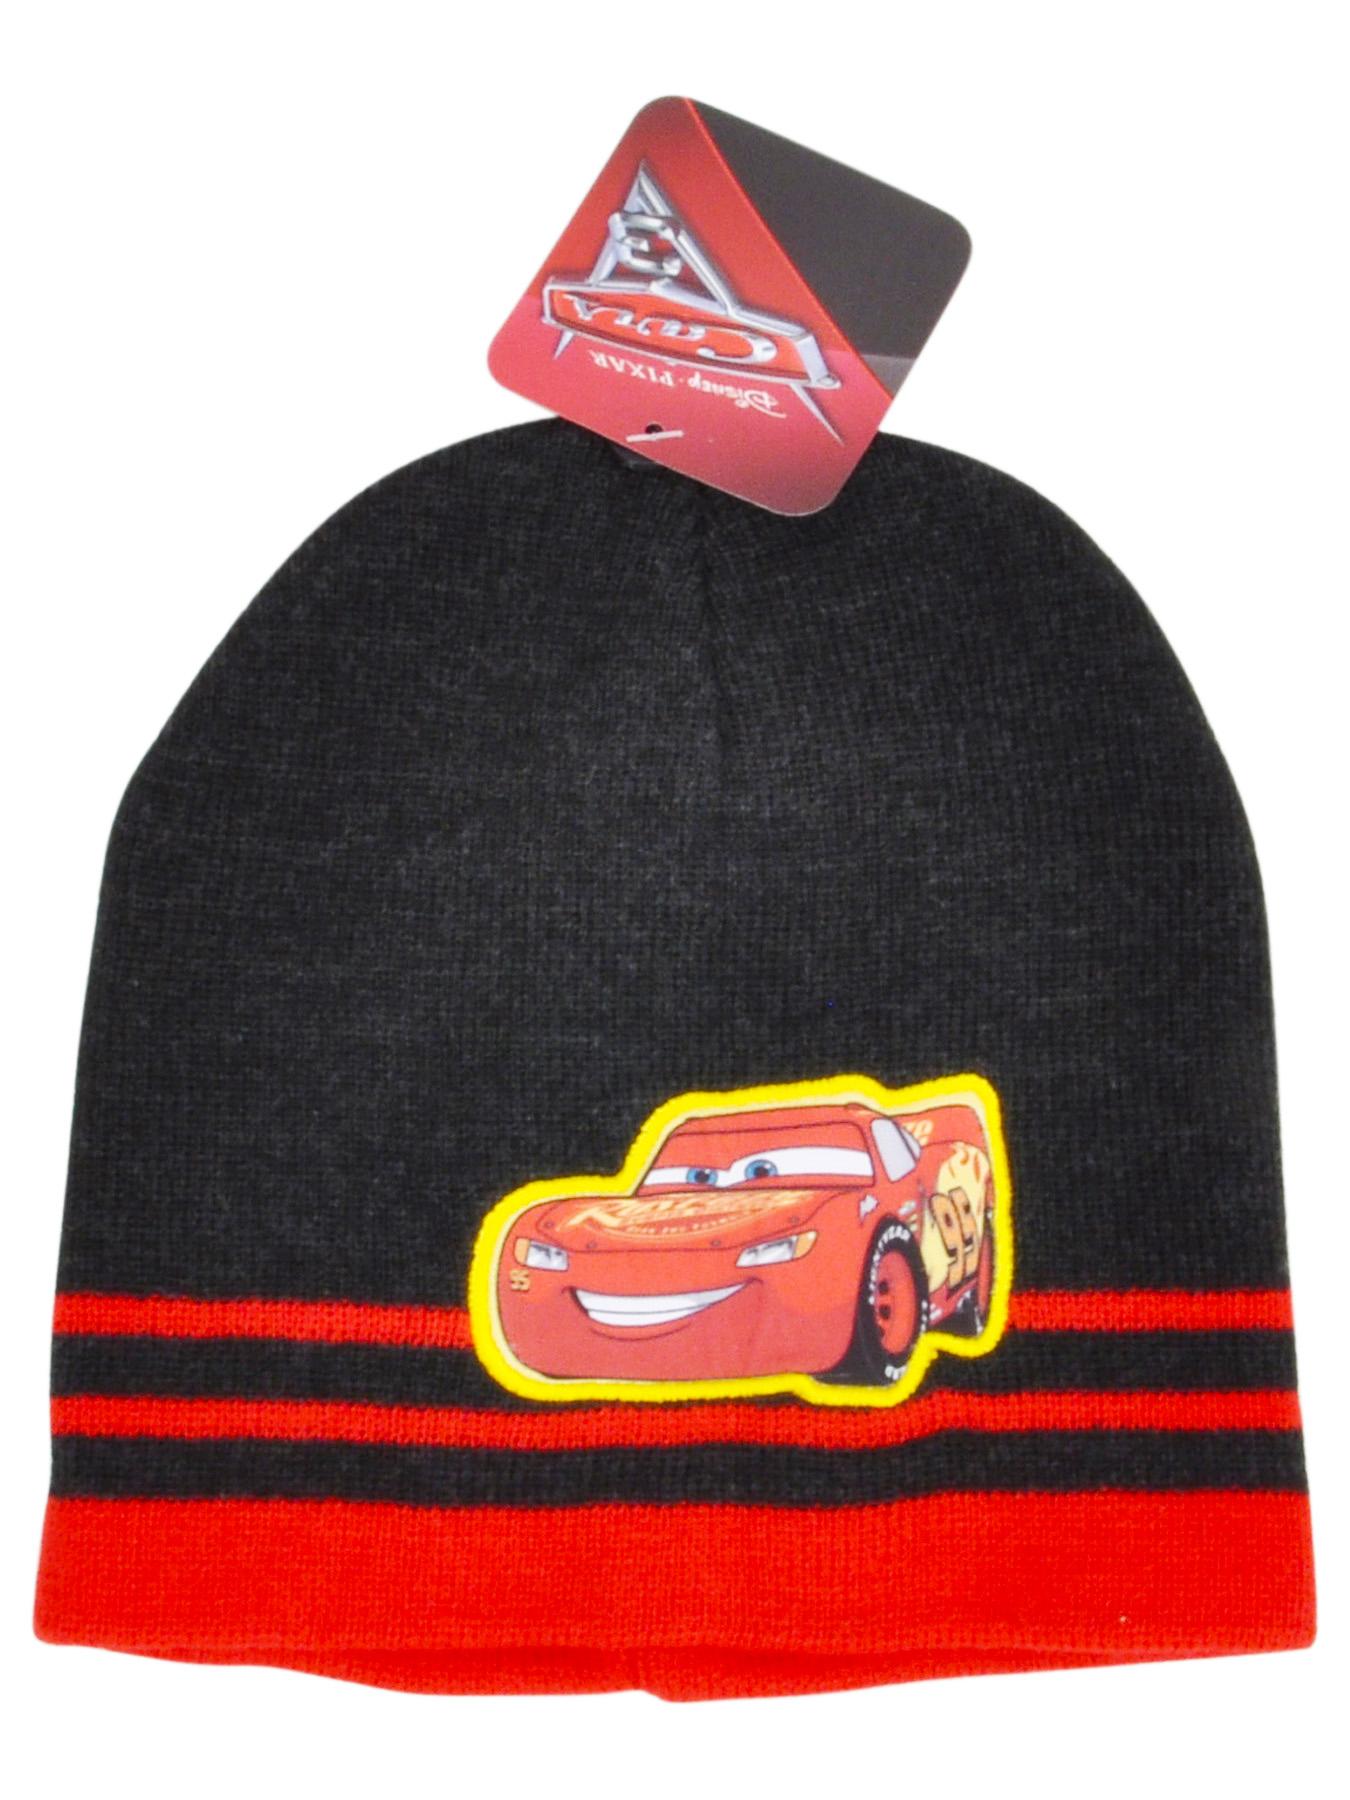 Boys Cars Movie Lightning McQueen Knit Cuffed Beanie Hat